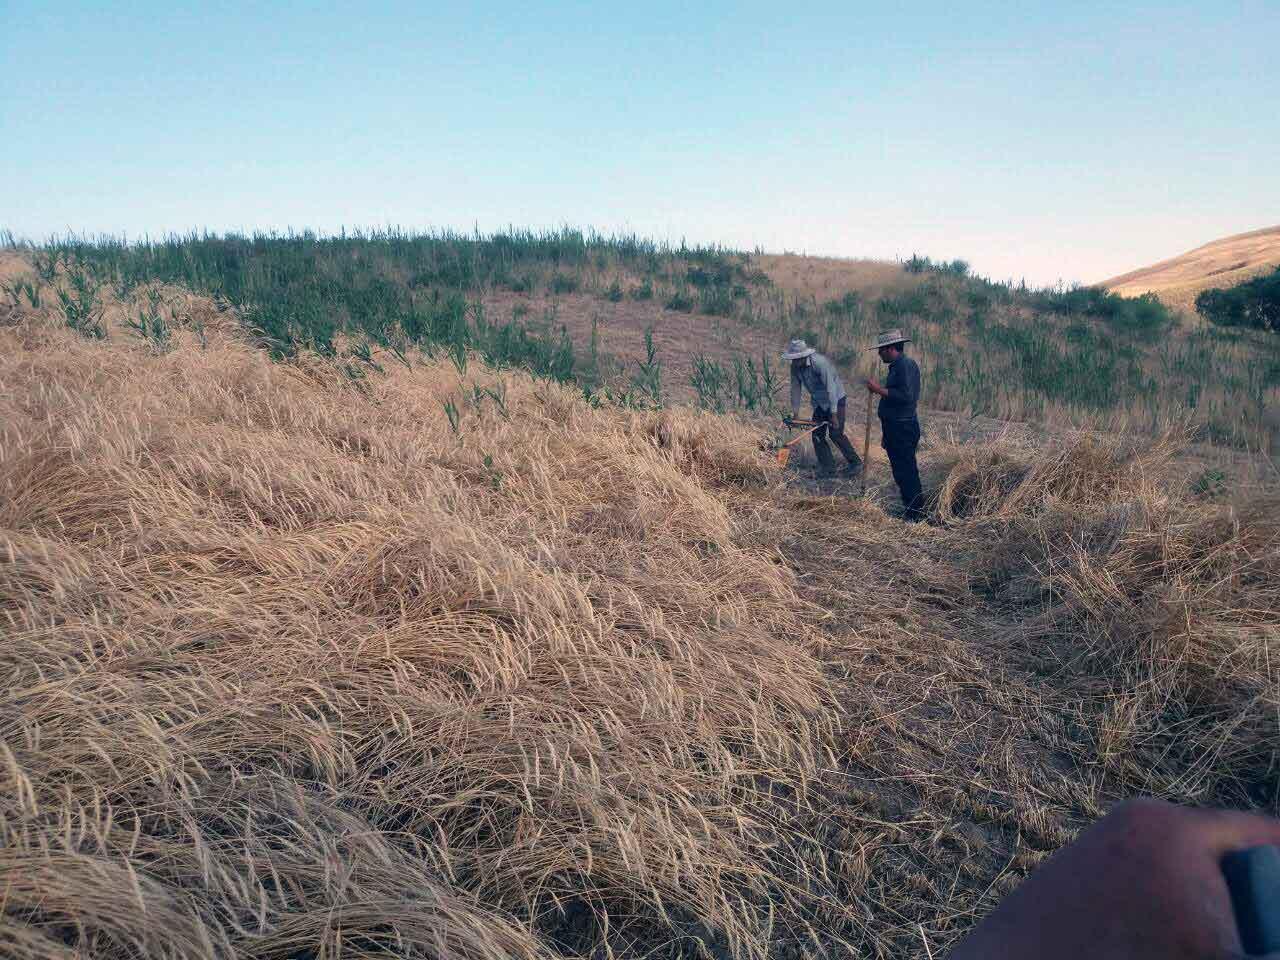 فصل برداشت محصول